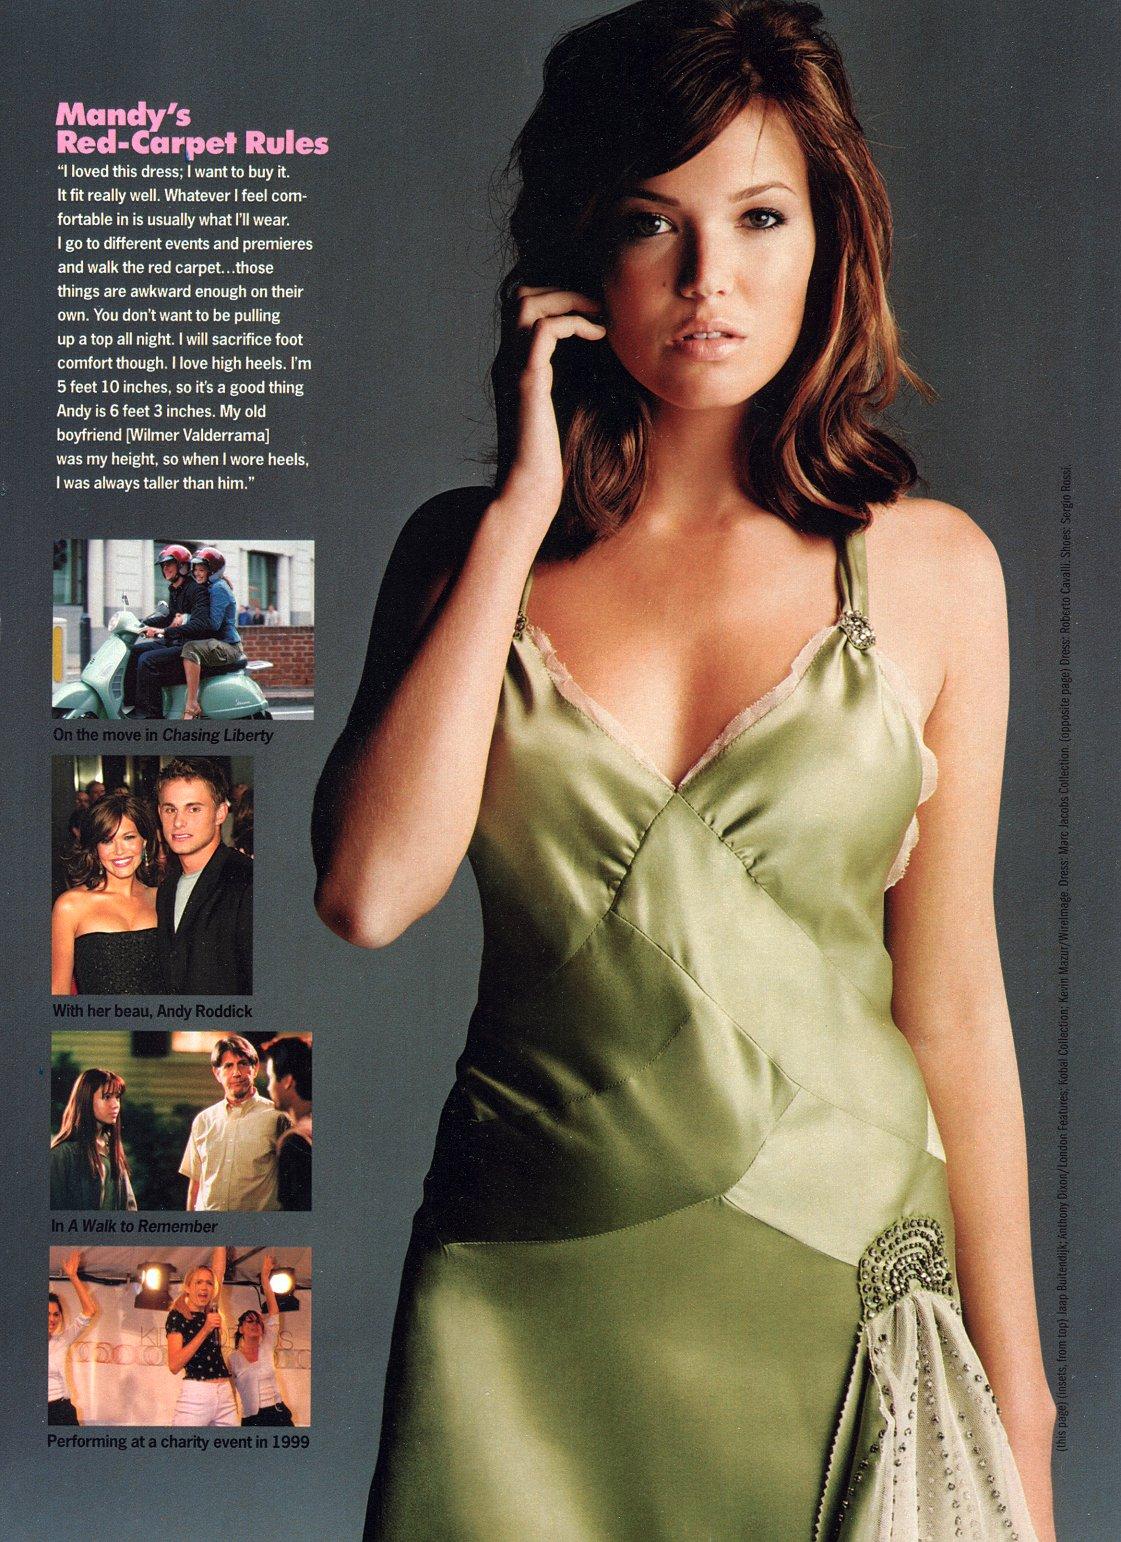 http://1.bp.blogspot.com/_GCAuqodmOE4/TRJnD9BoODI/AAAAAAAAF6A/bc1iKVu59DQ/s1600/Sexiest+Mandy+Moore++%25282%2529.jpg